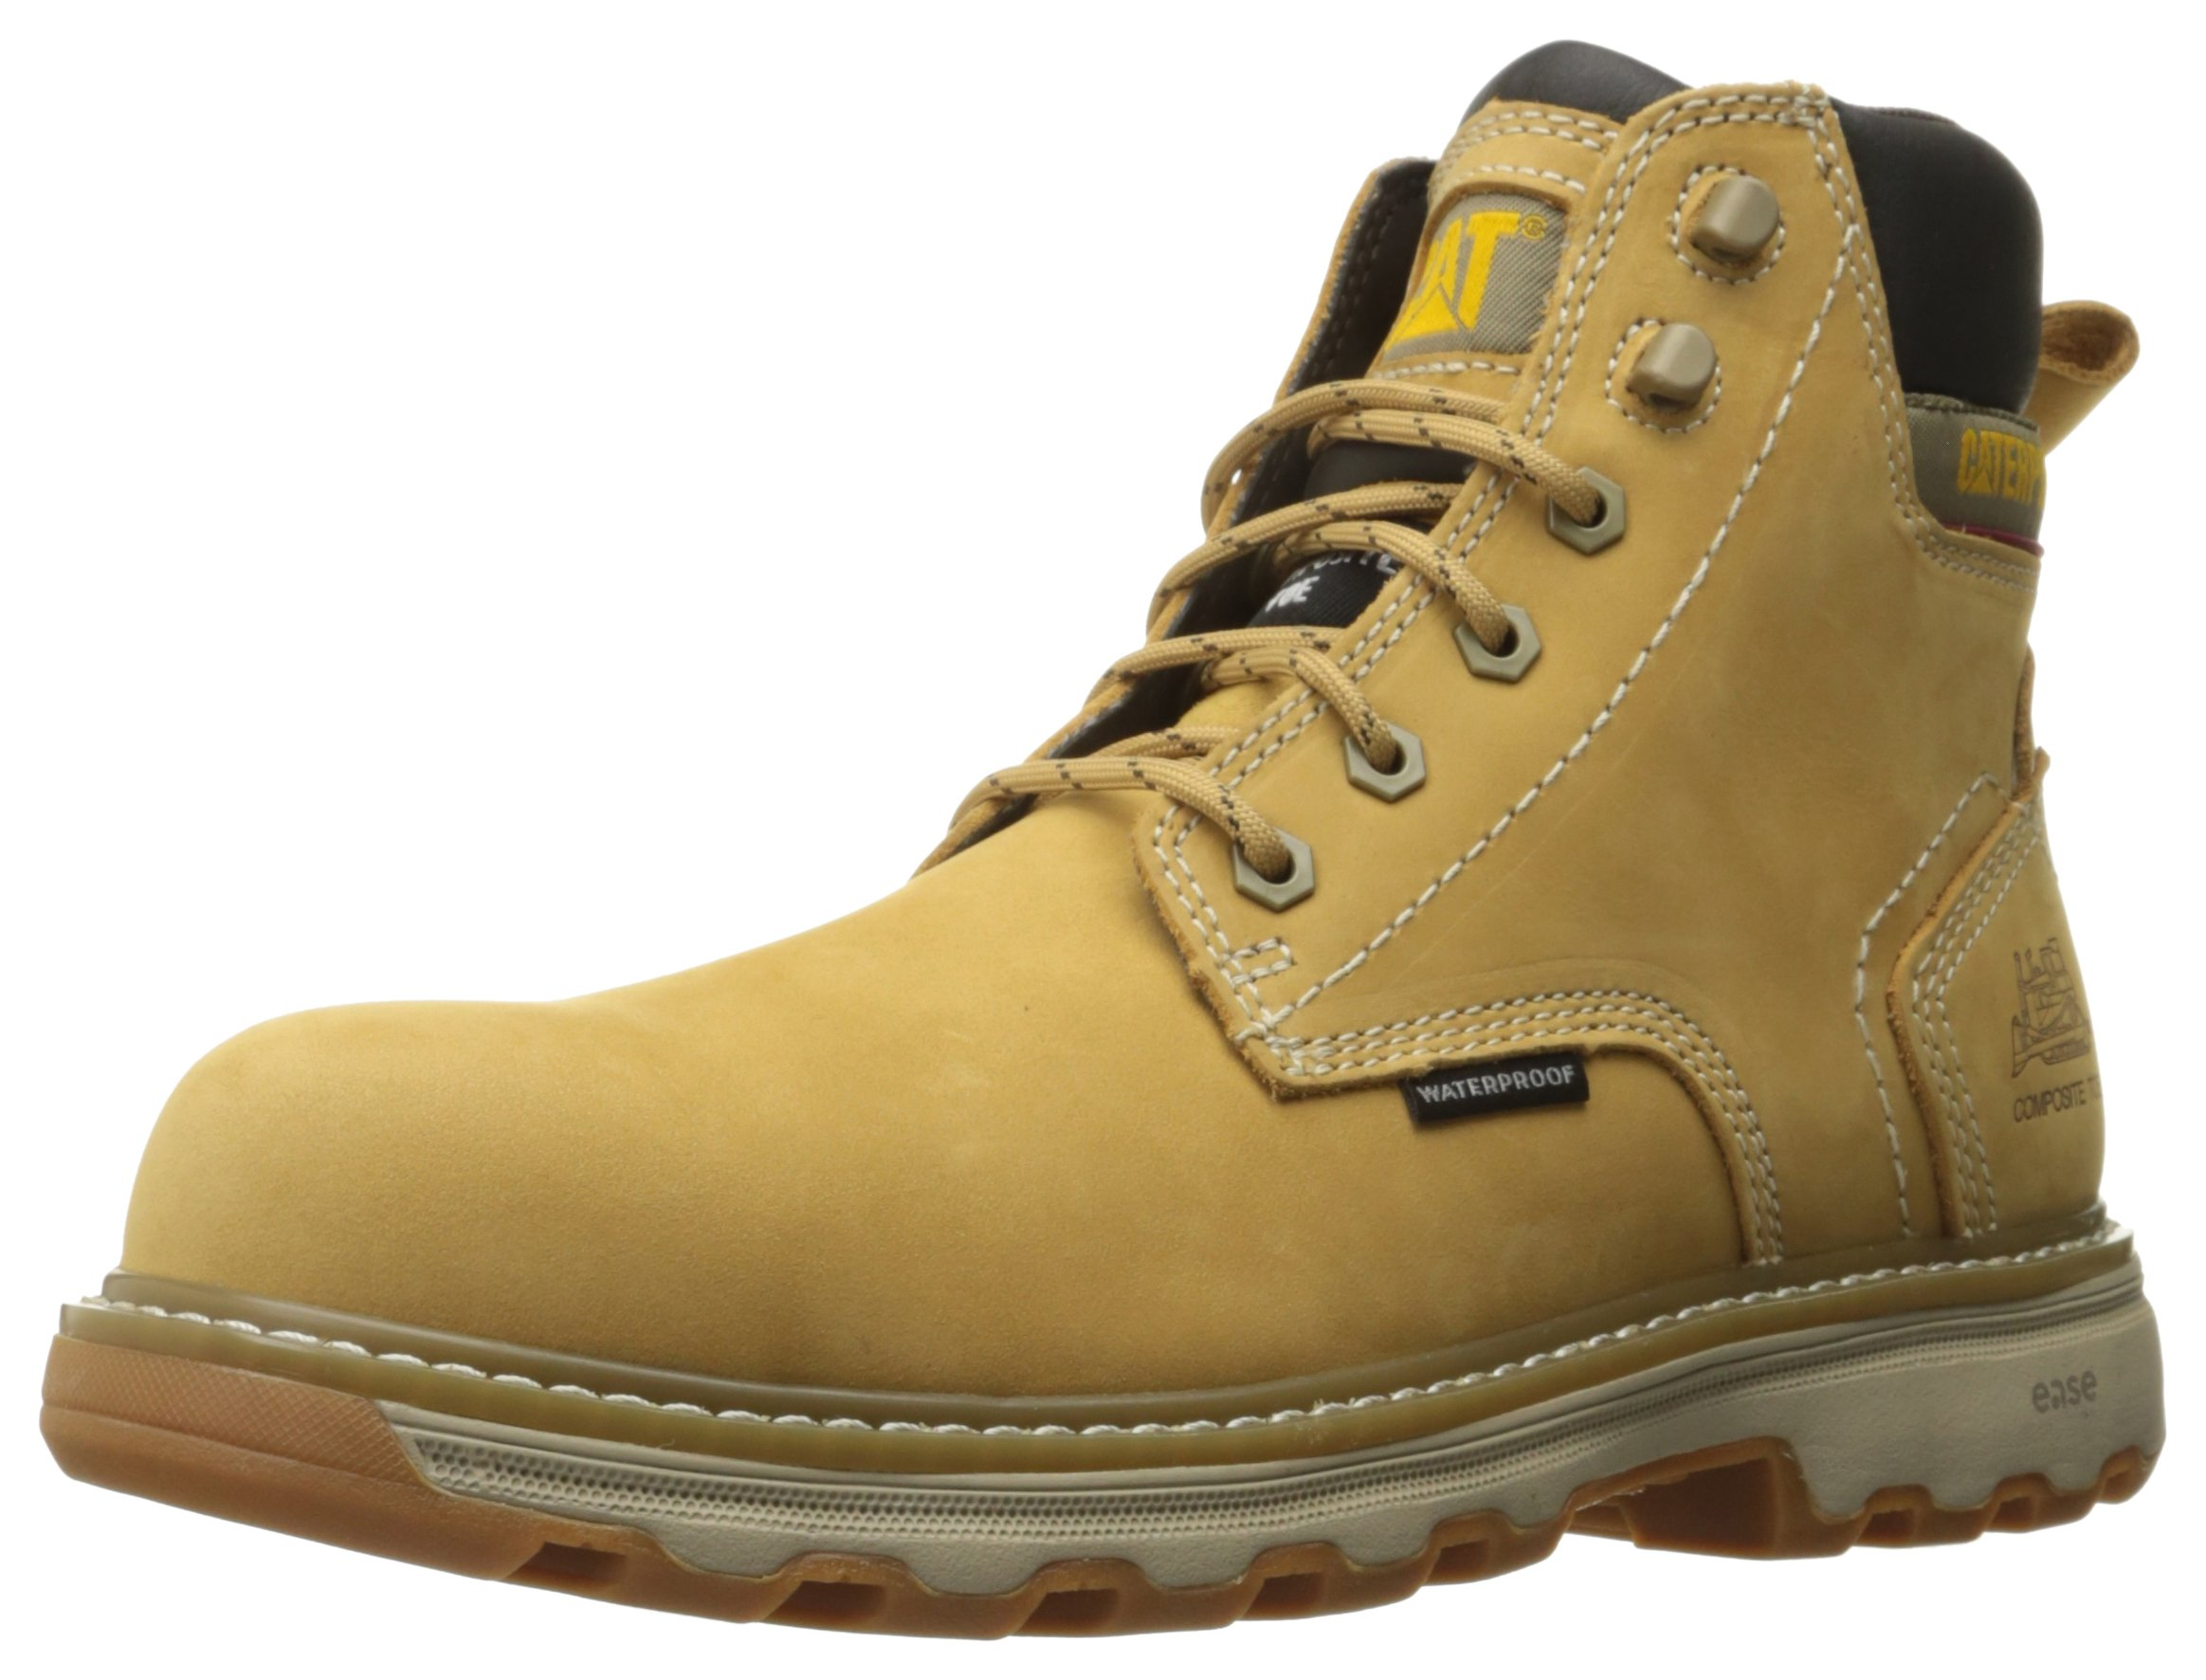 Caterpillar Men's Precision Comp Toe Waterproof Work Boot, Honey Reset, 12 M US